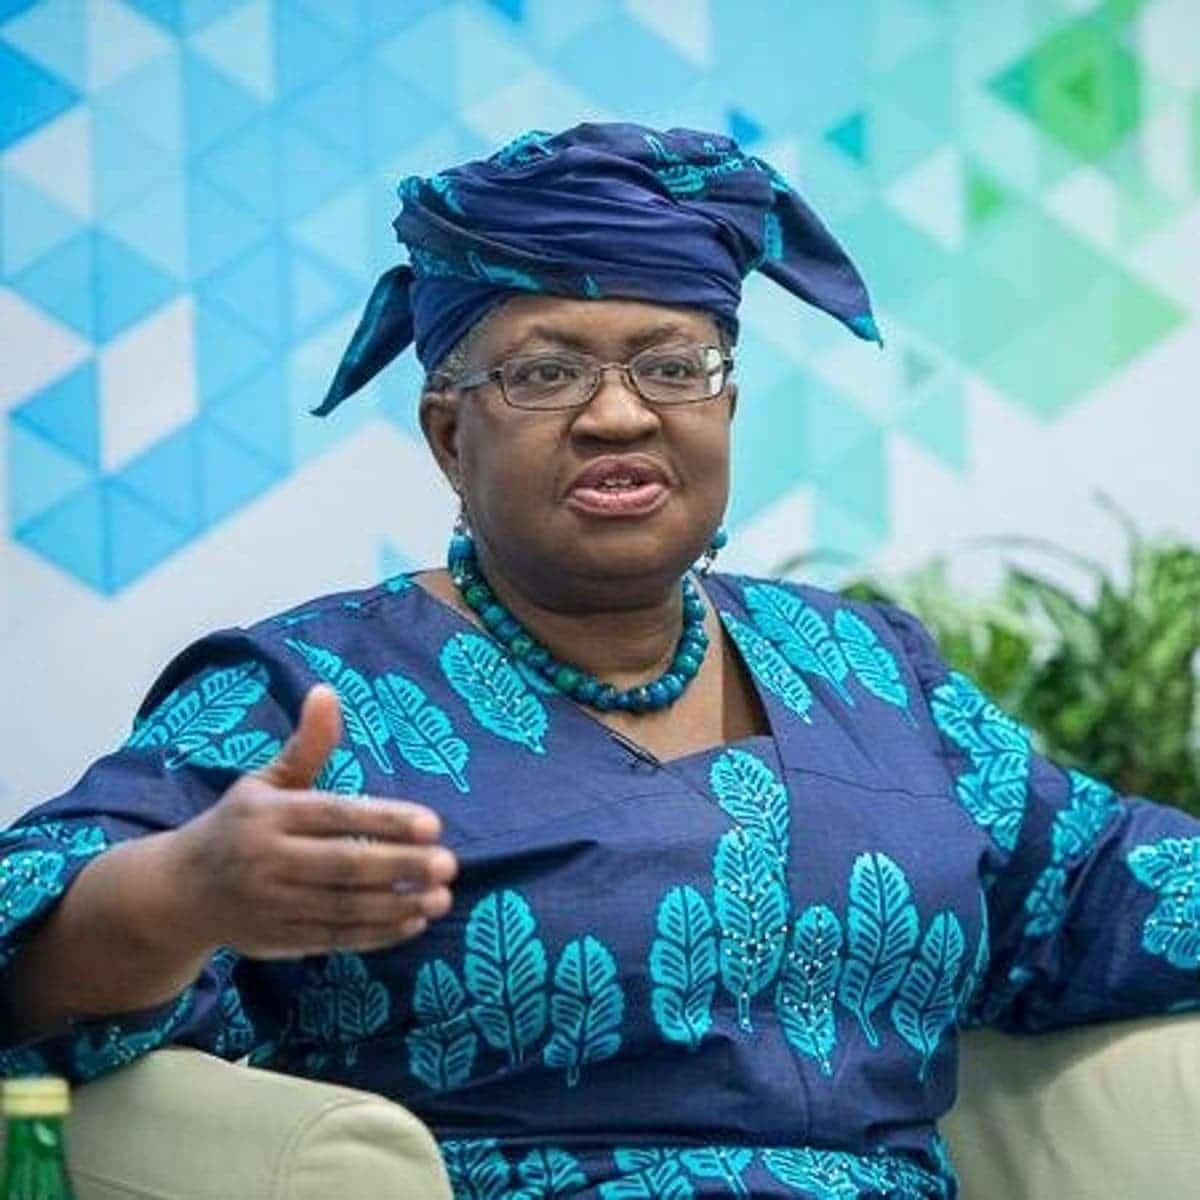 Who is Ngozi Okonjo-Iweala, the new Director-General of the World Trade Organization